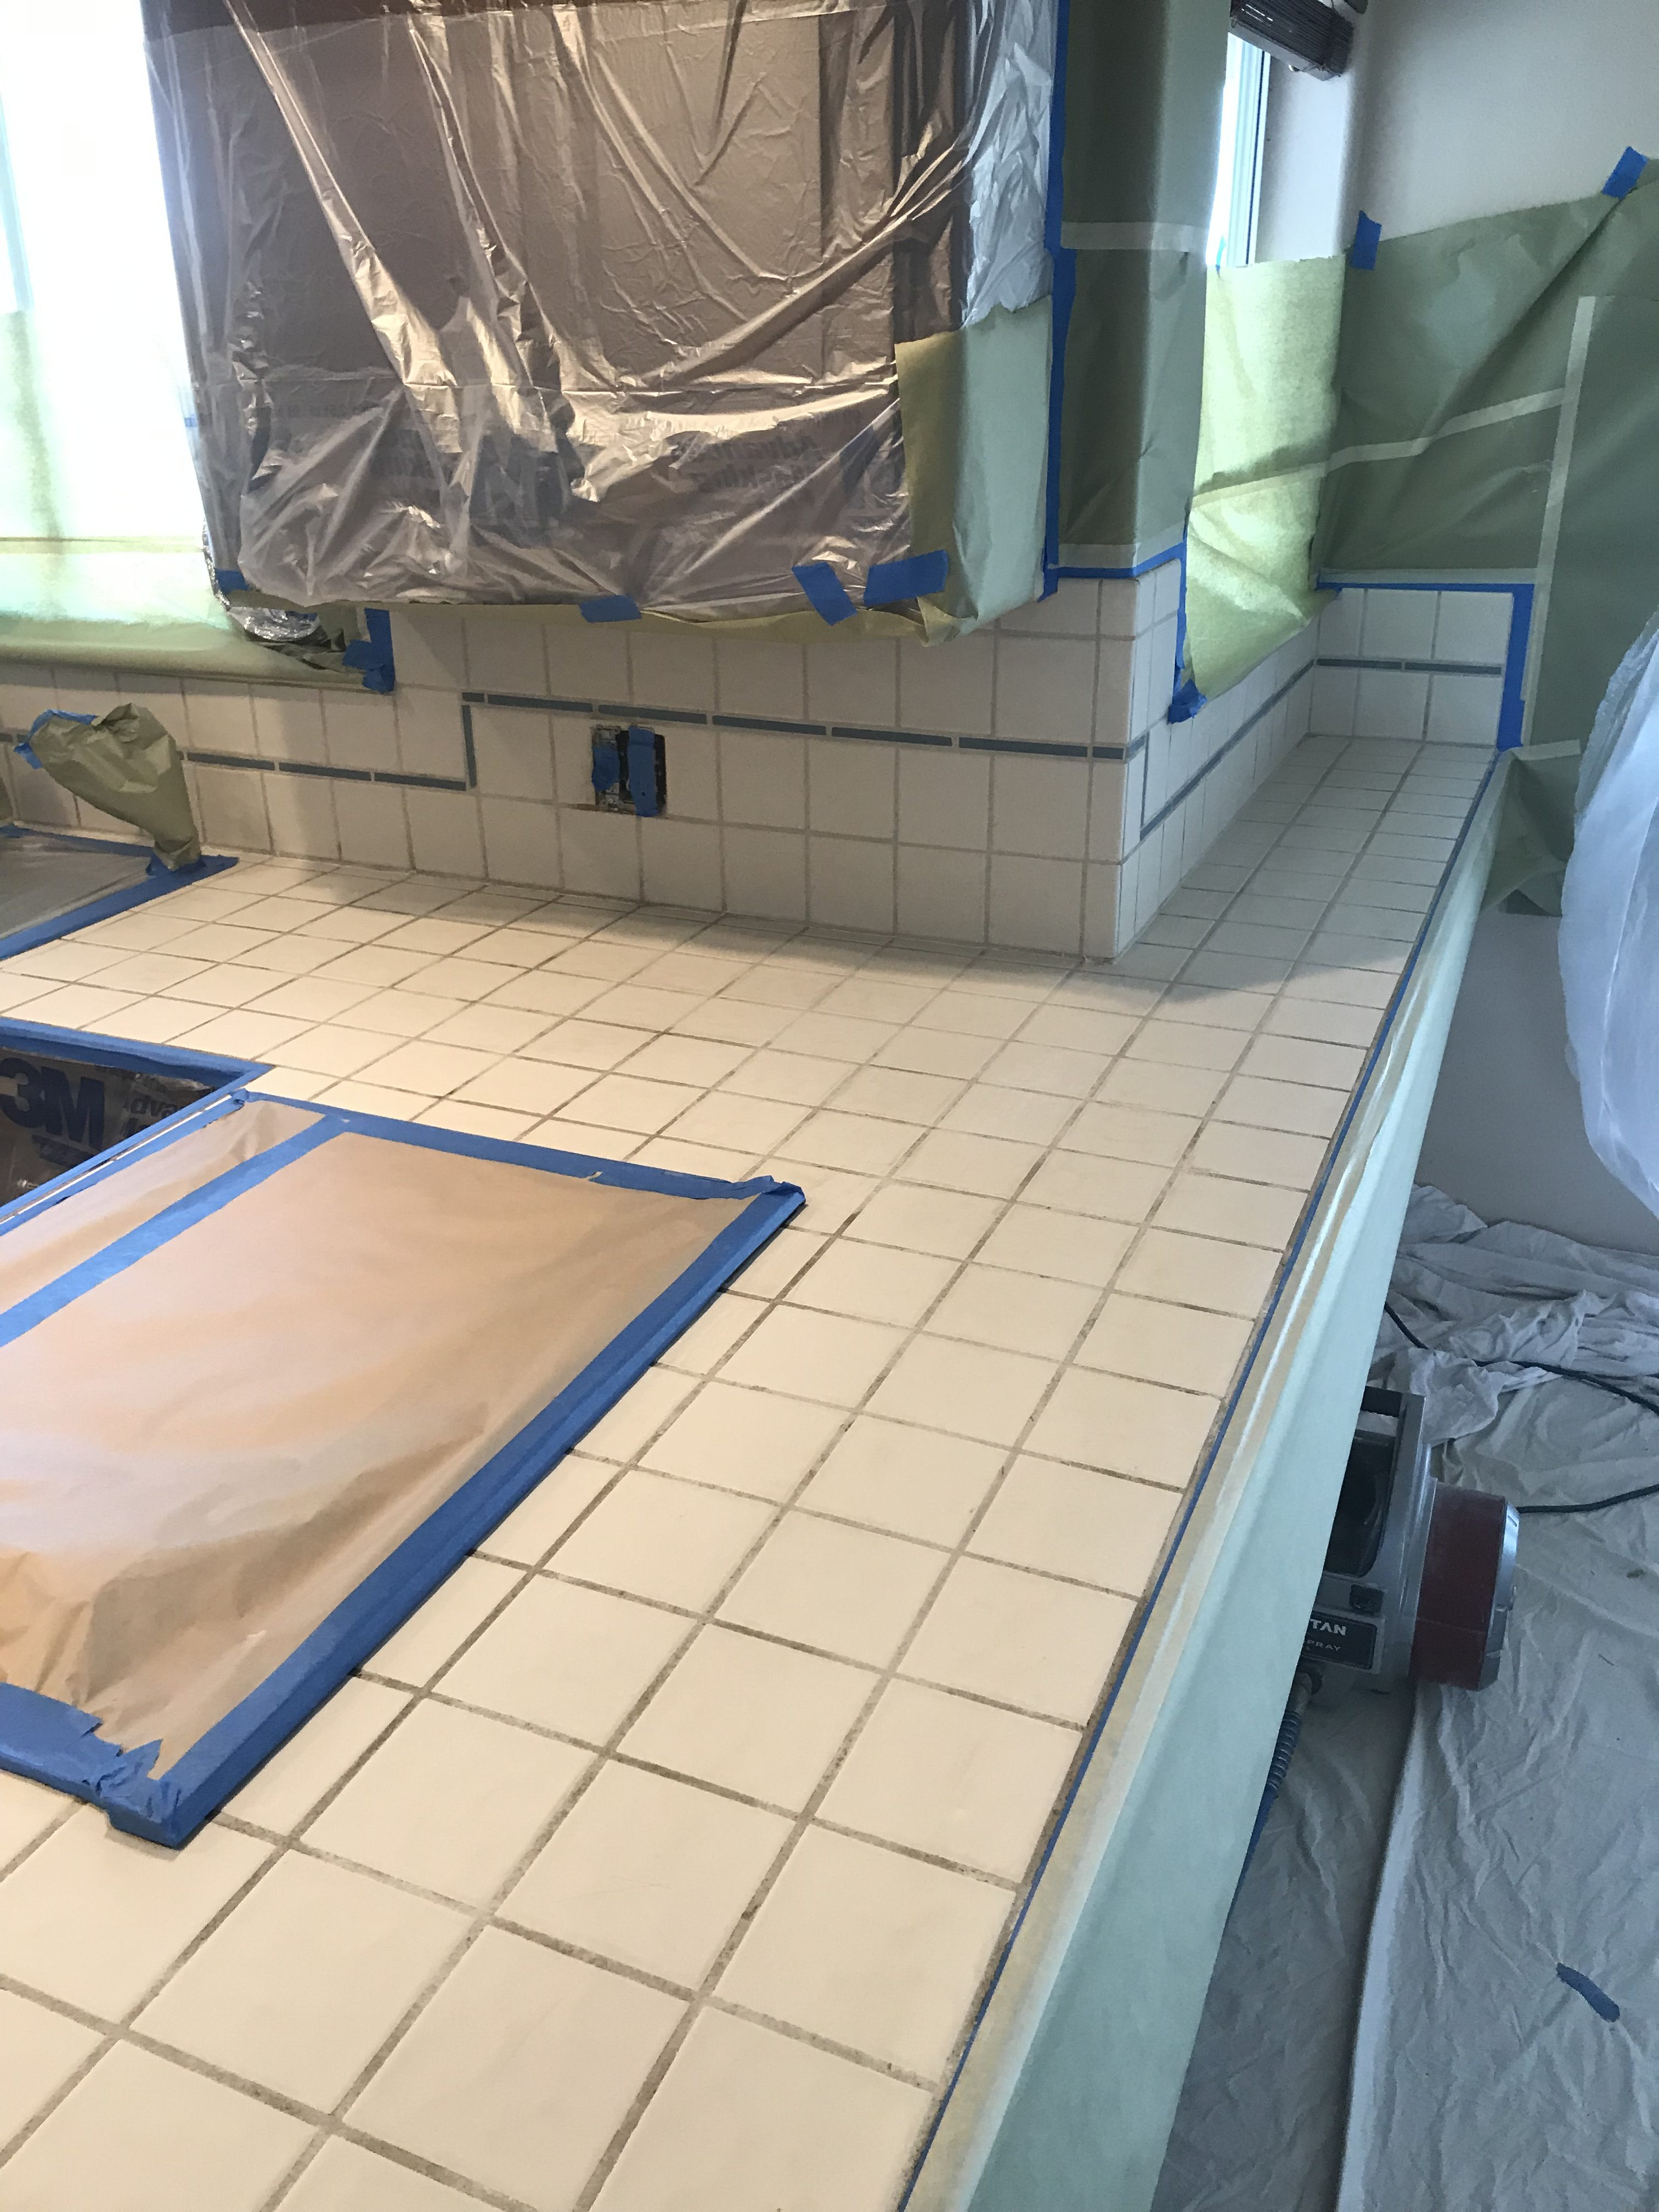 Kitchen Countertop Tile Resurfacing Before - NuFinishPro